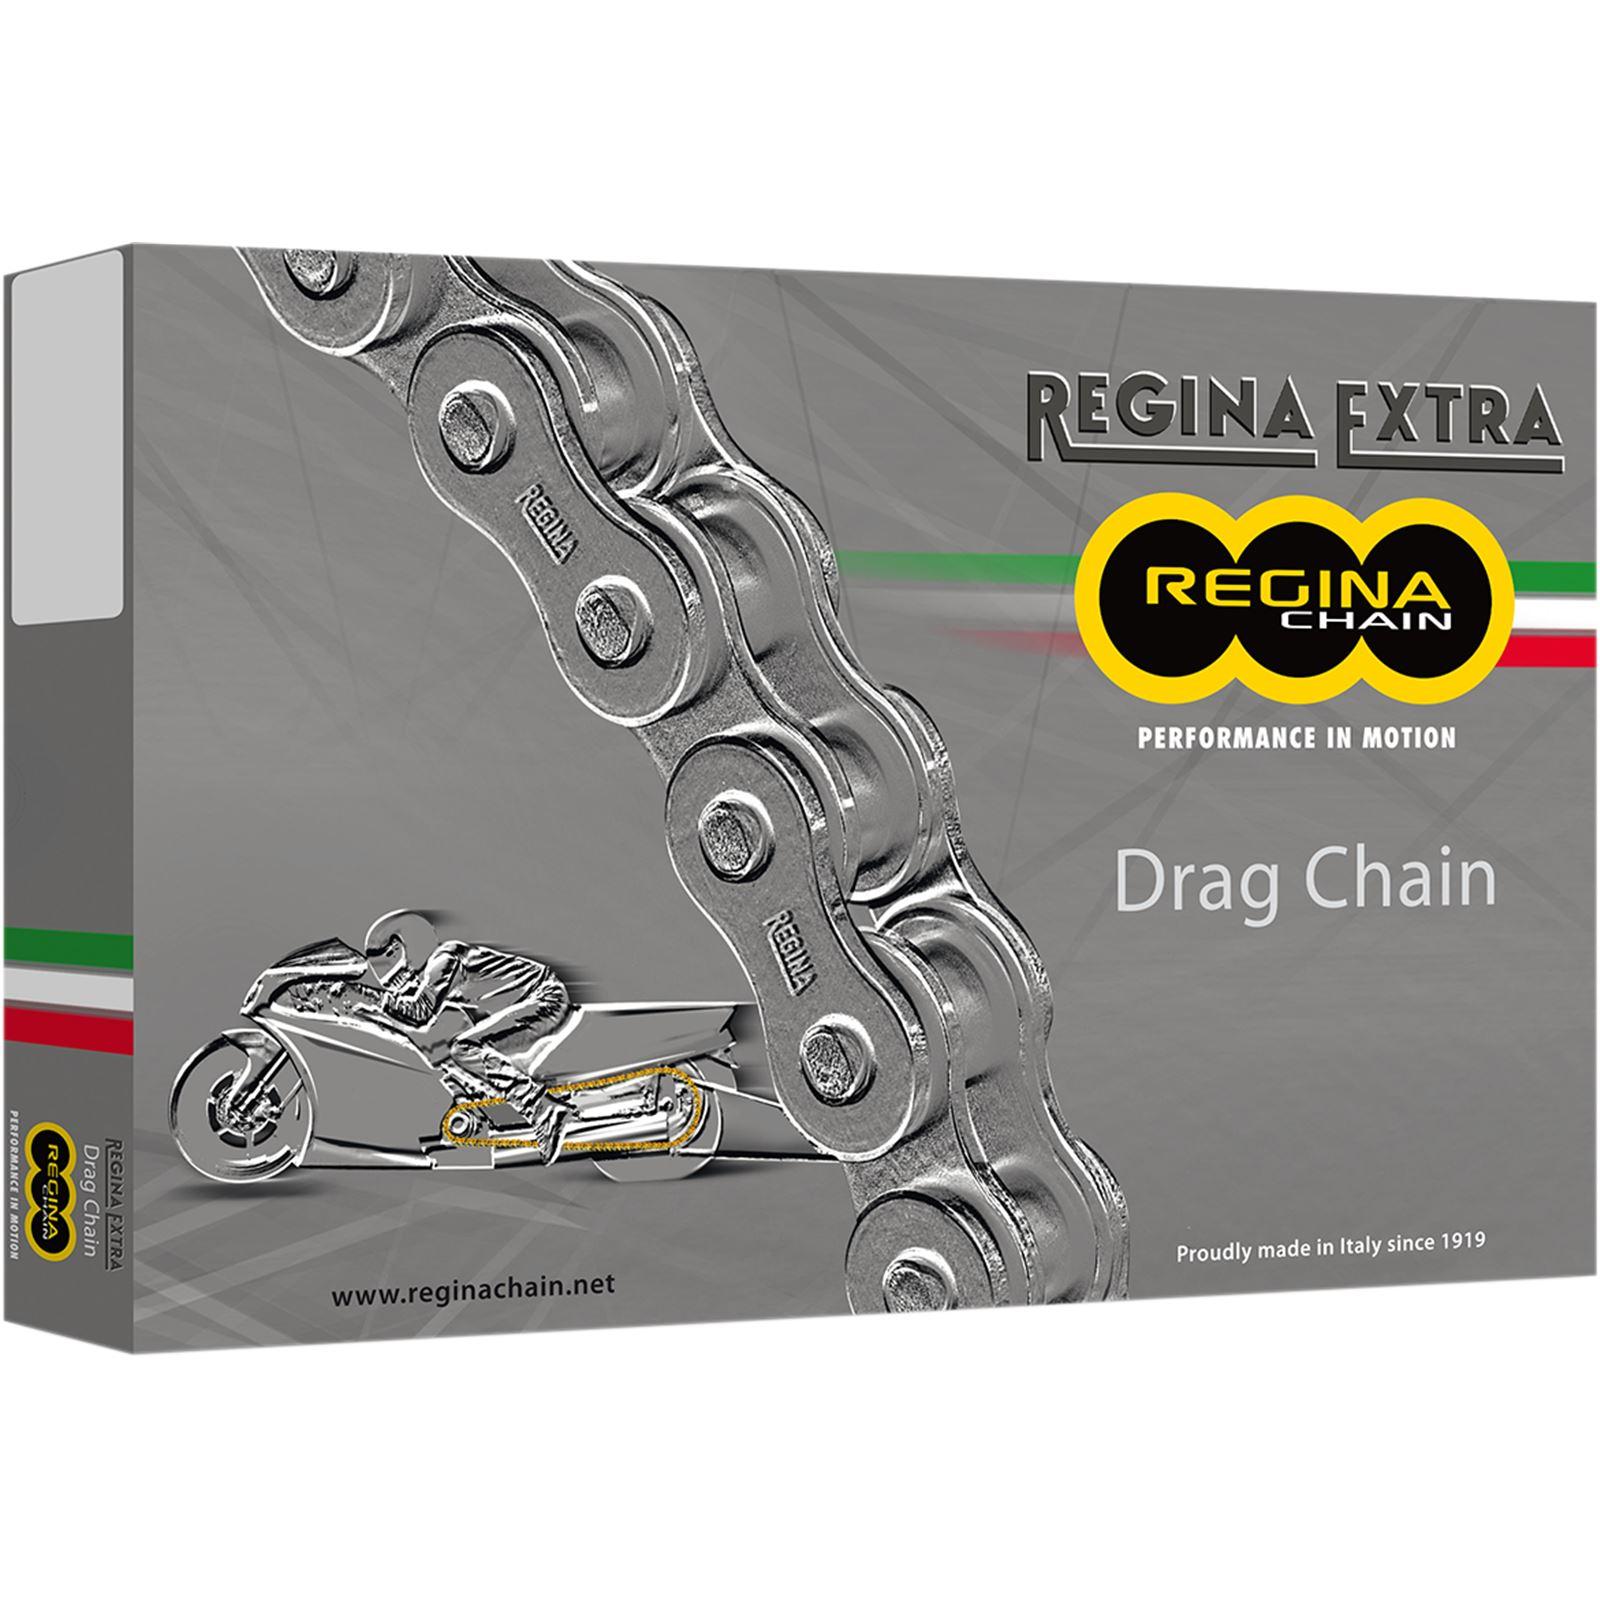 Regina 530 DR Extra - Drag Racing Chain - 140 Links